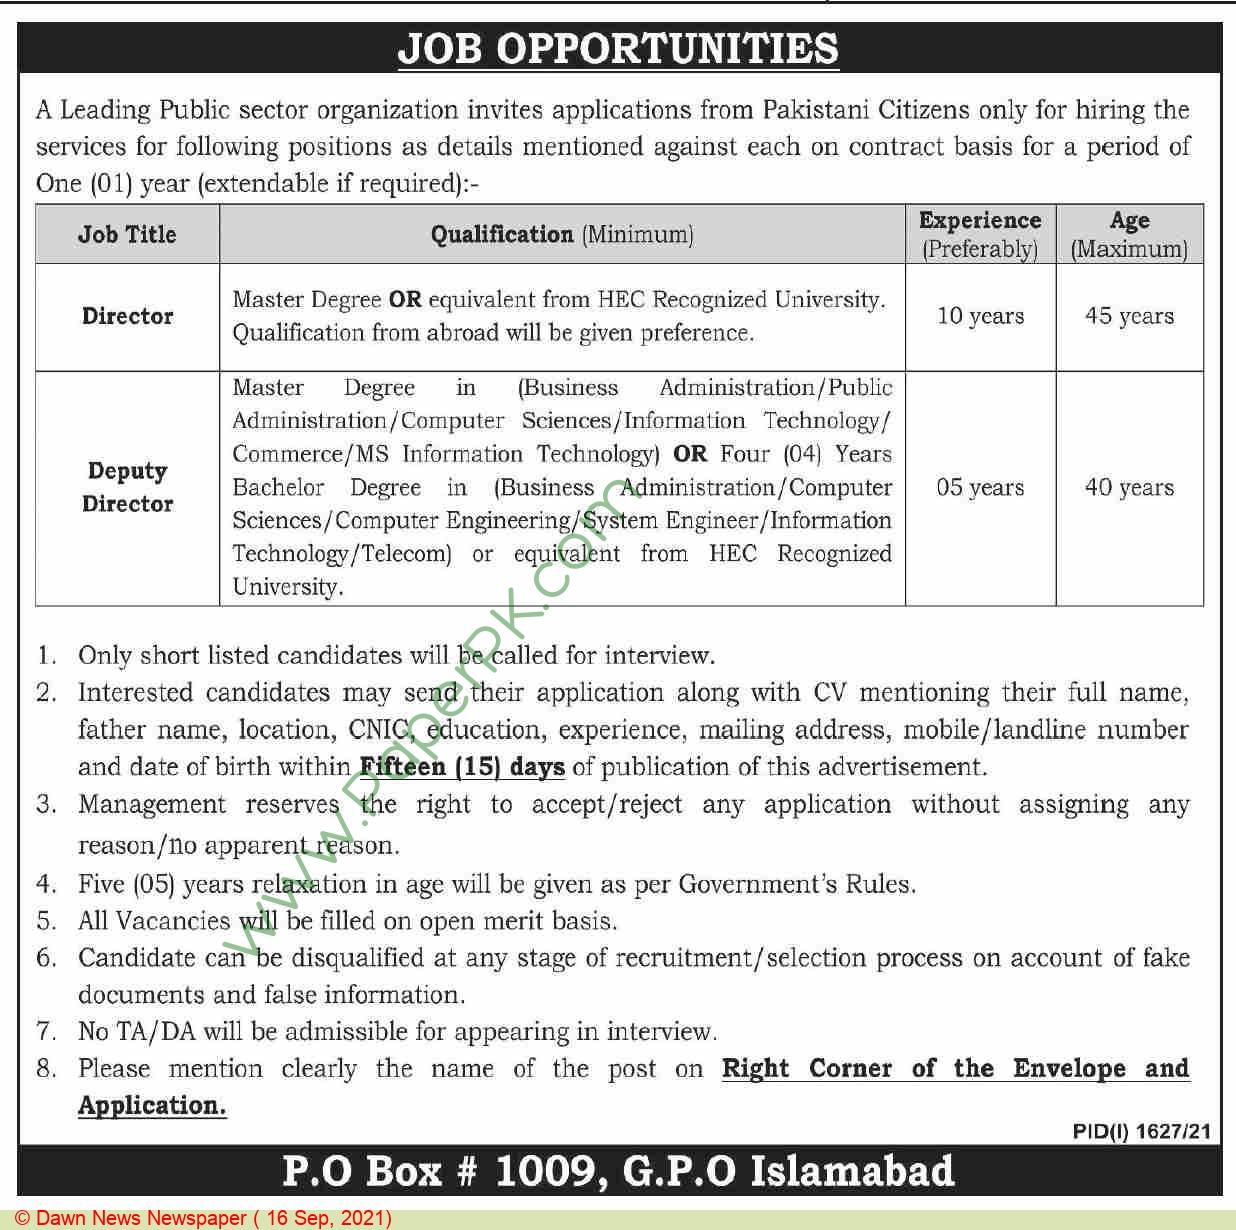 Public Sector Organization Islamabad Jobs For Director advertisemet in newspaper on September 16,2021